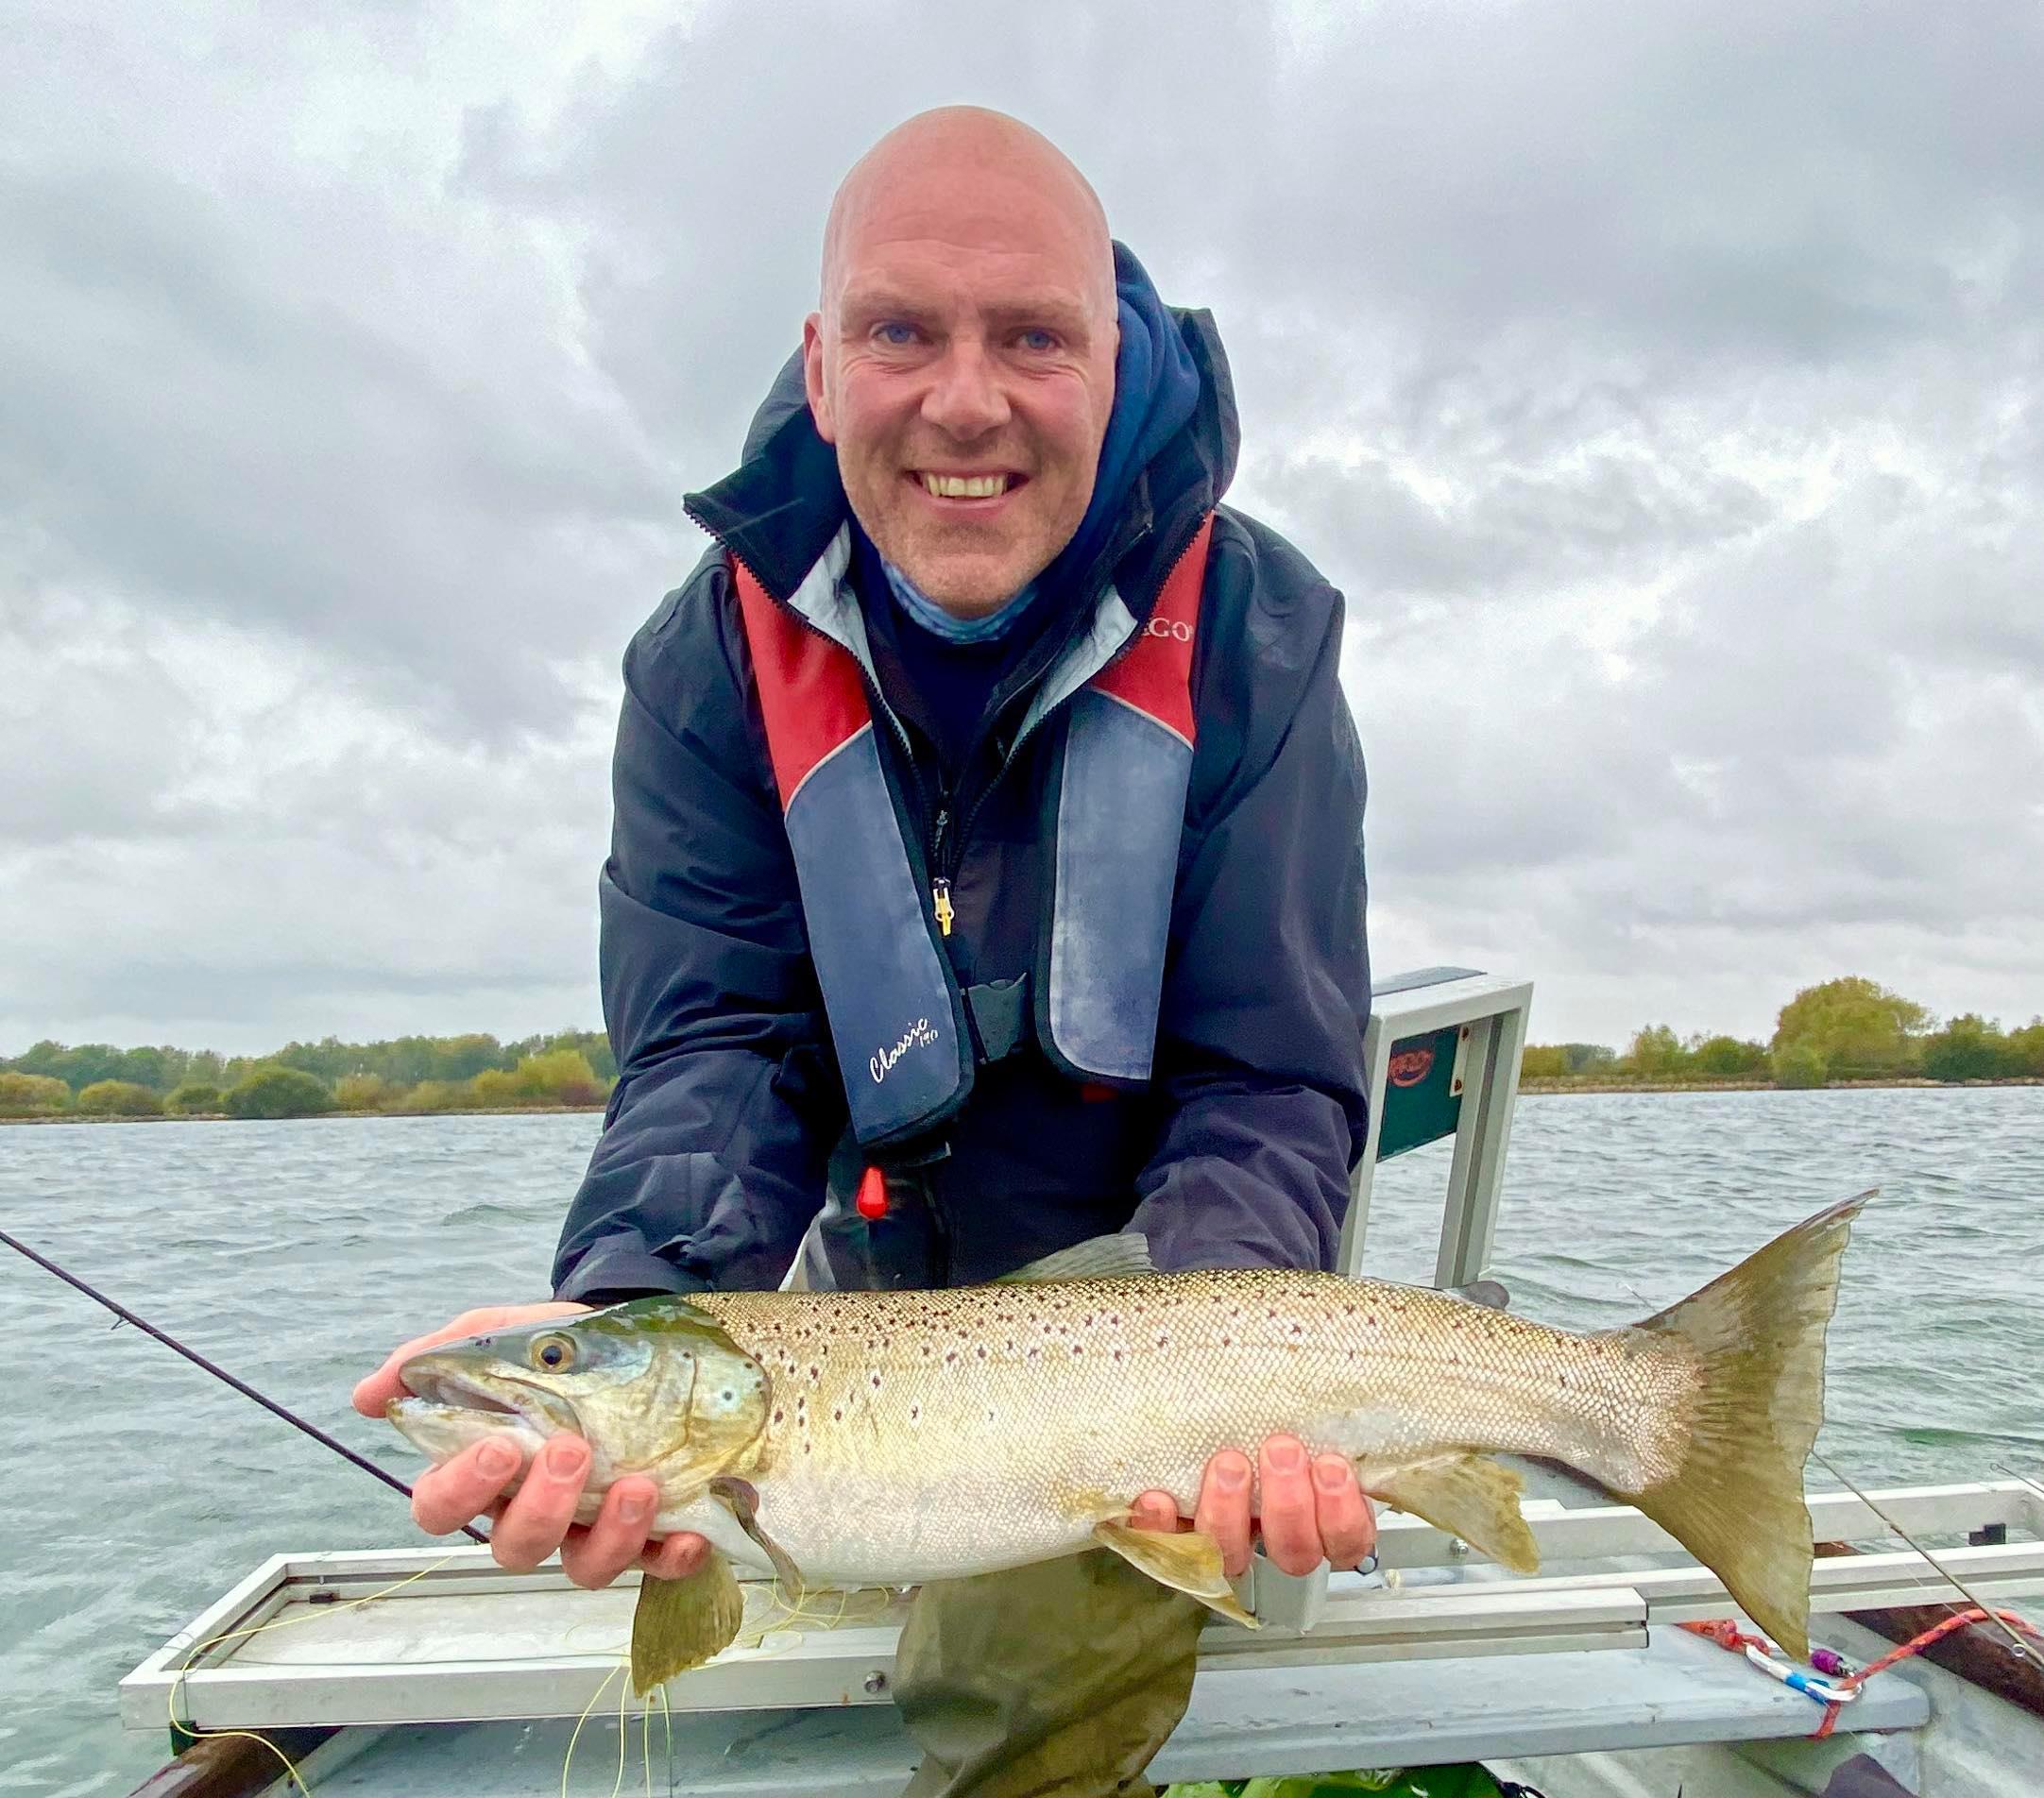 Gaz Jones with a 7 pound brown taken on a black humungous lure at Rutland water